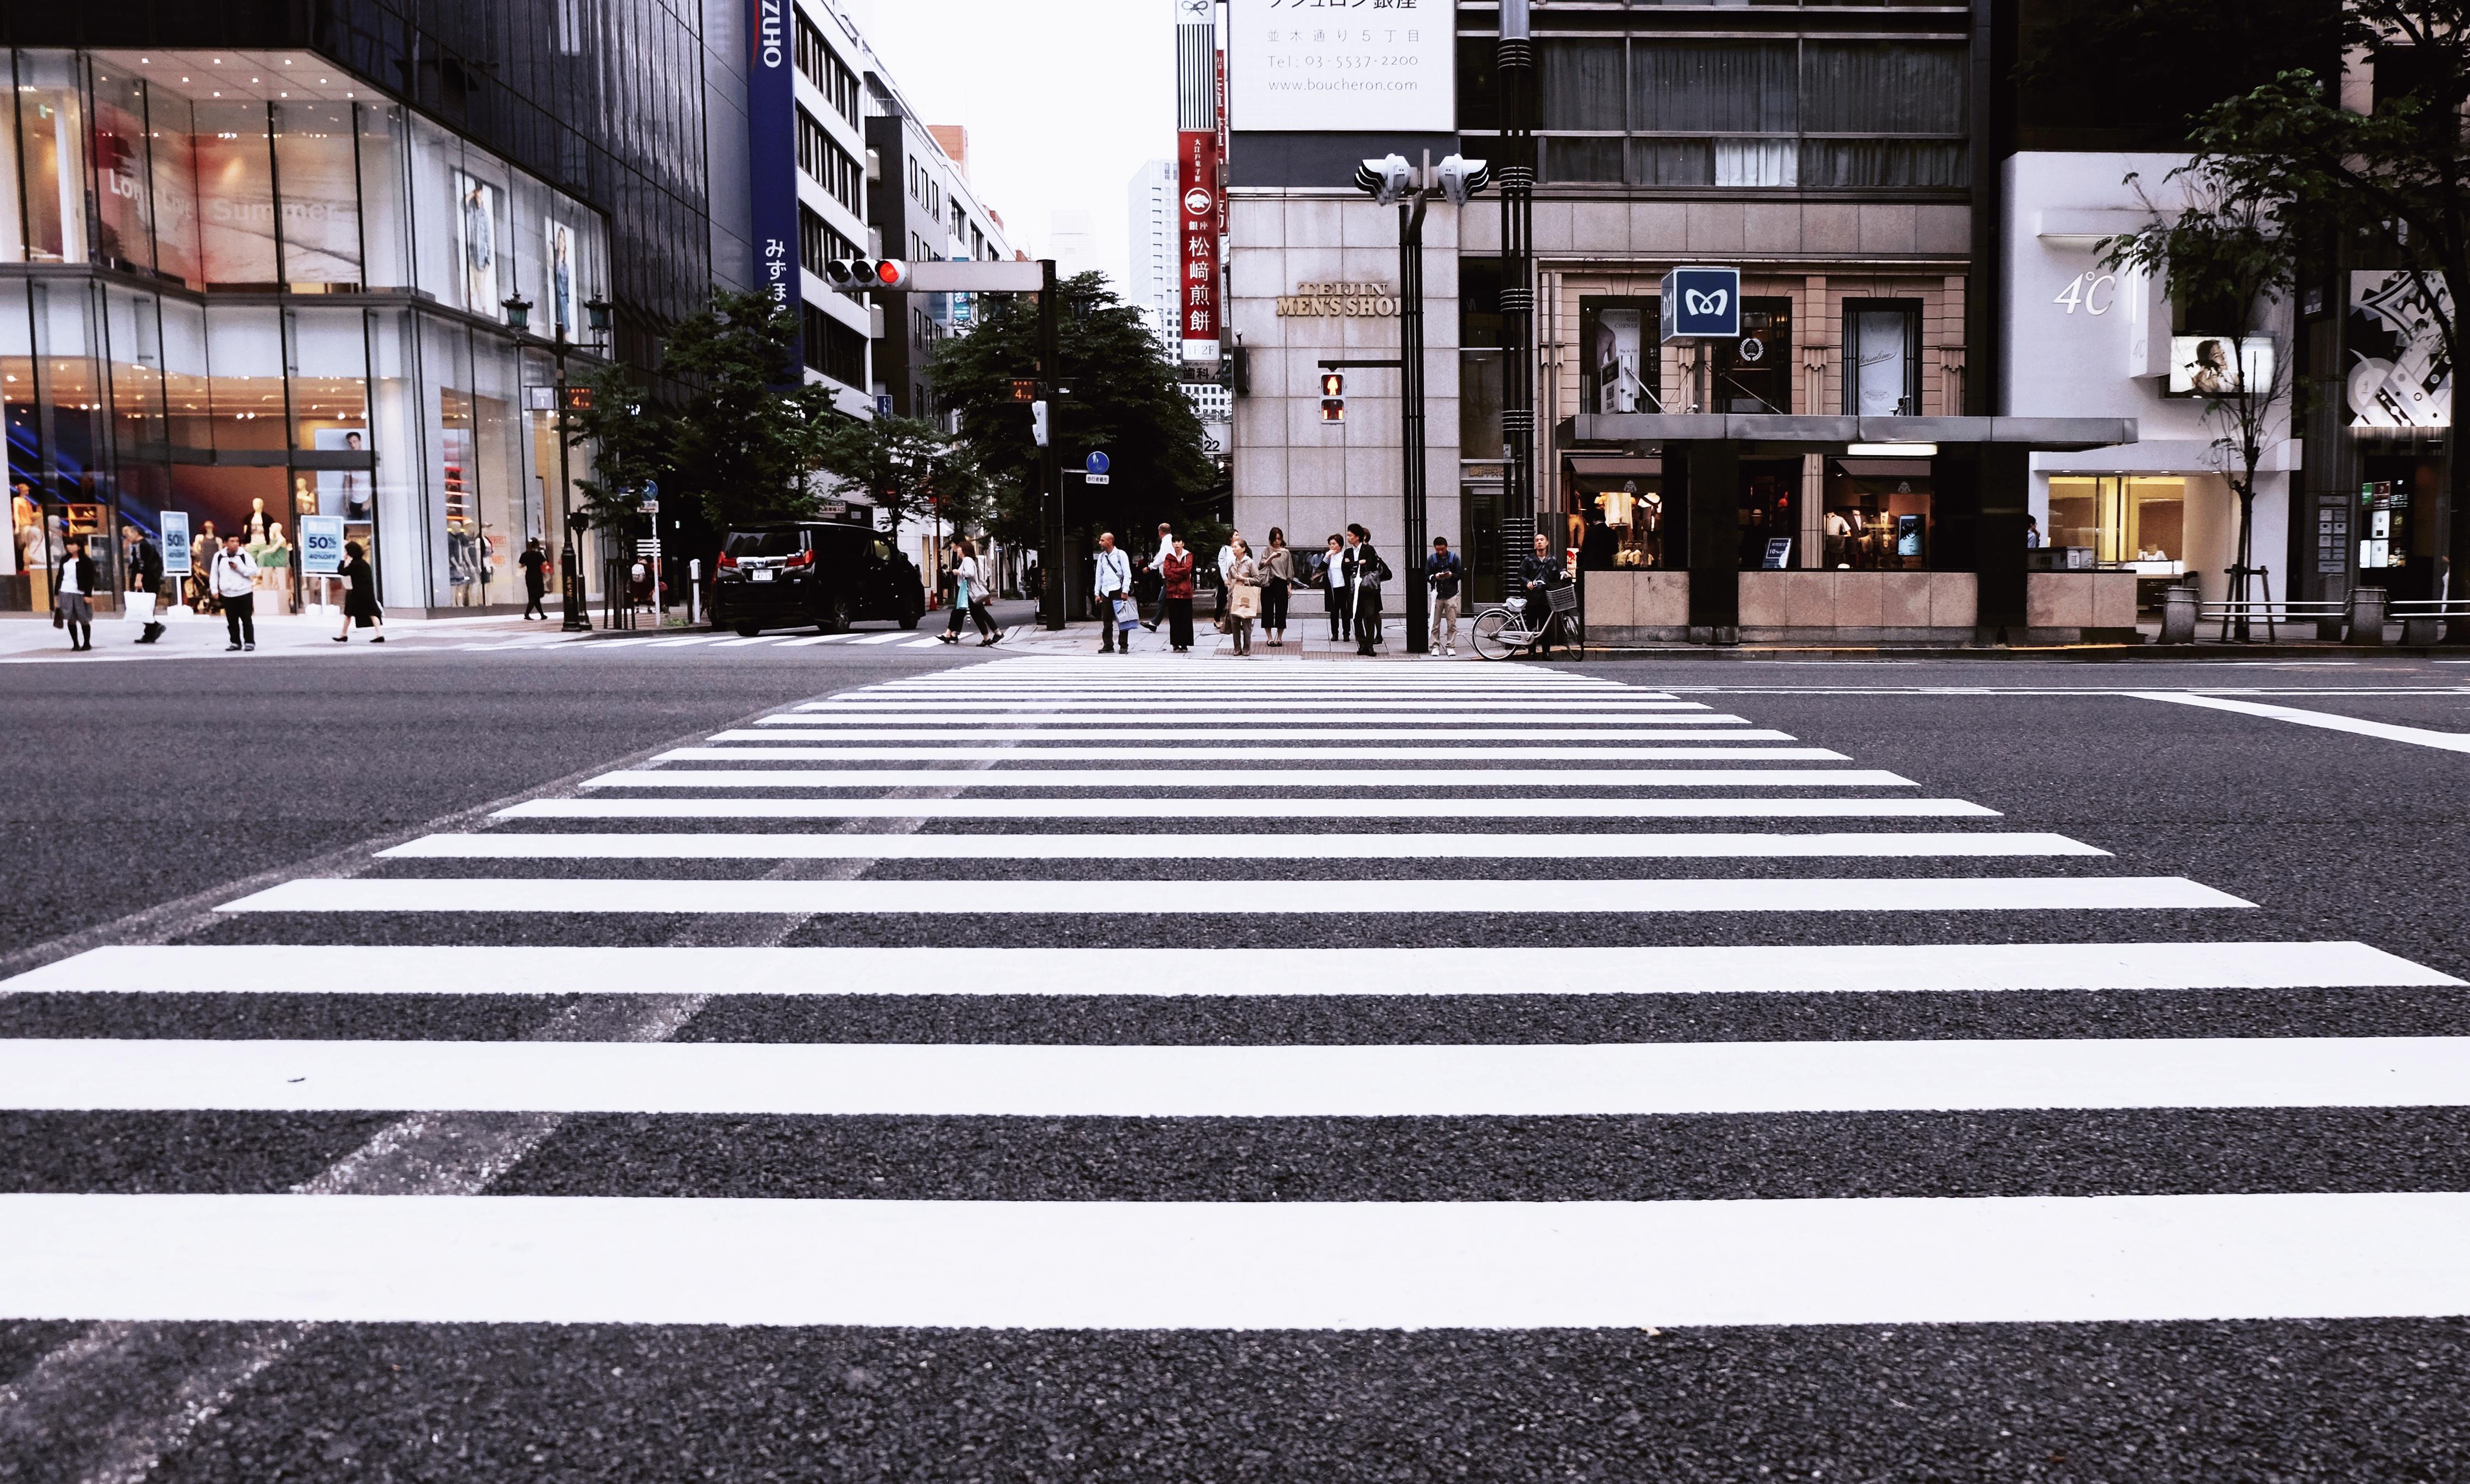 Free Images : Person, Street, Sidewalk, City, Asphalt